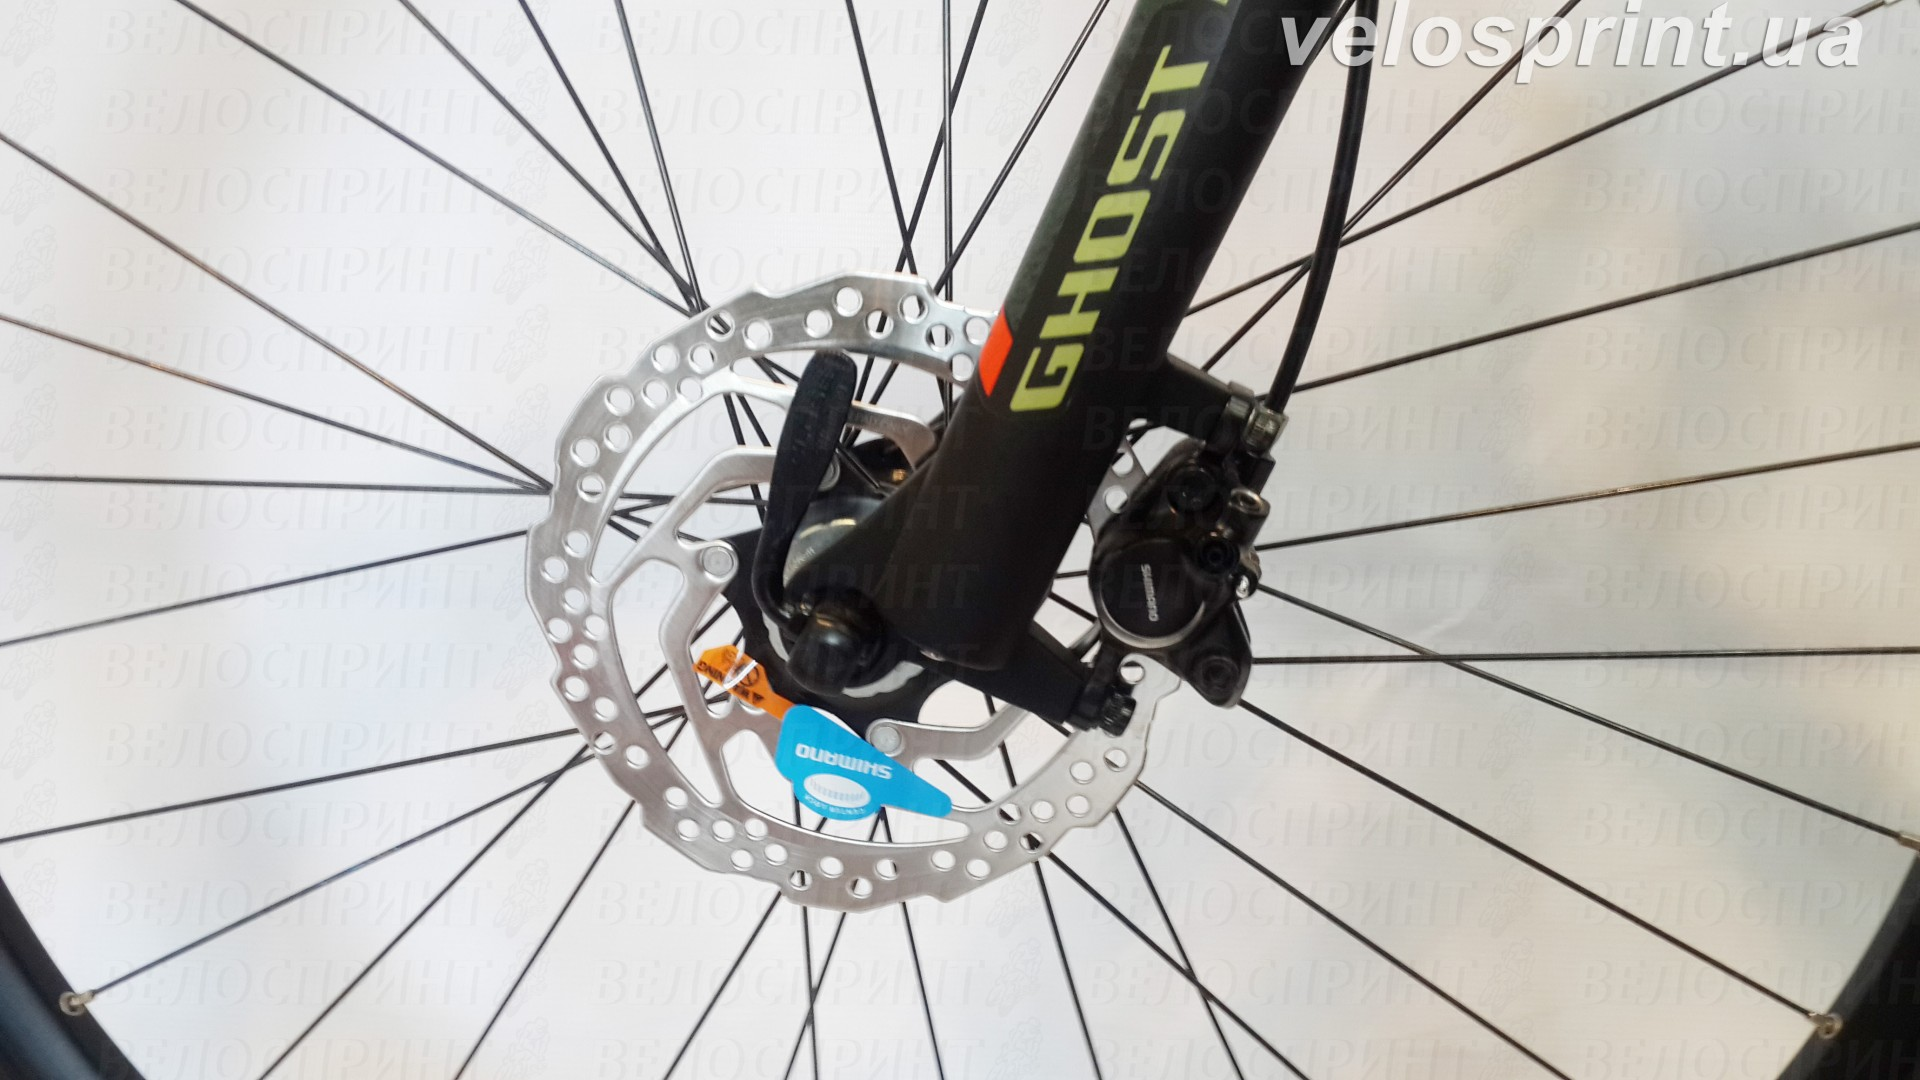 Велосипед GHOST Kato 2 AL 27.5 forestgreen/armygreen/neonred передний тормоз год 2017